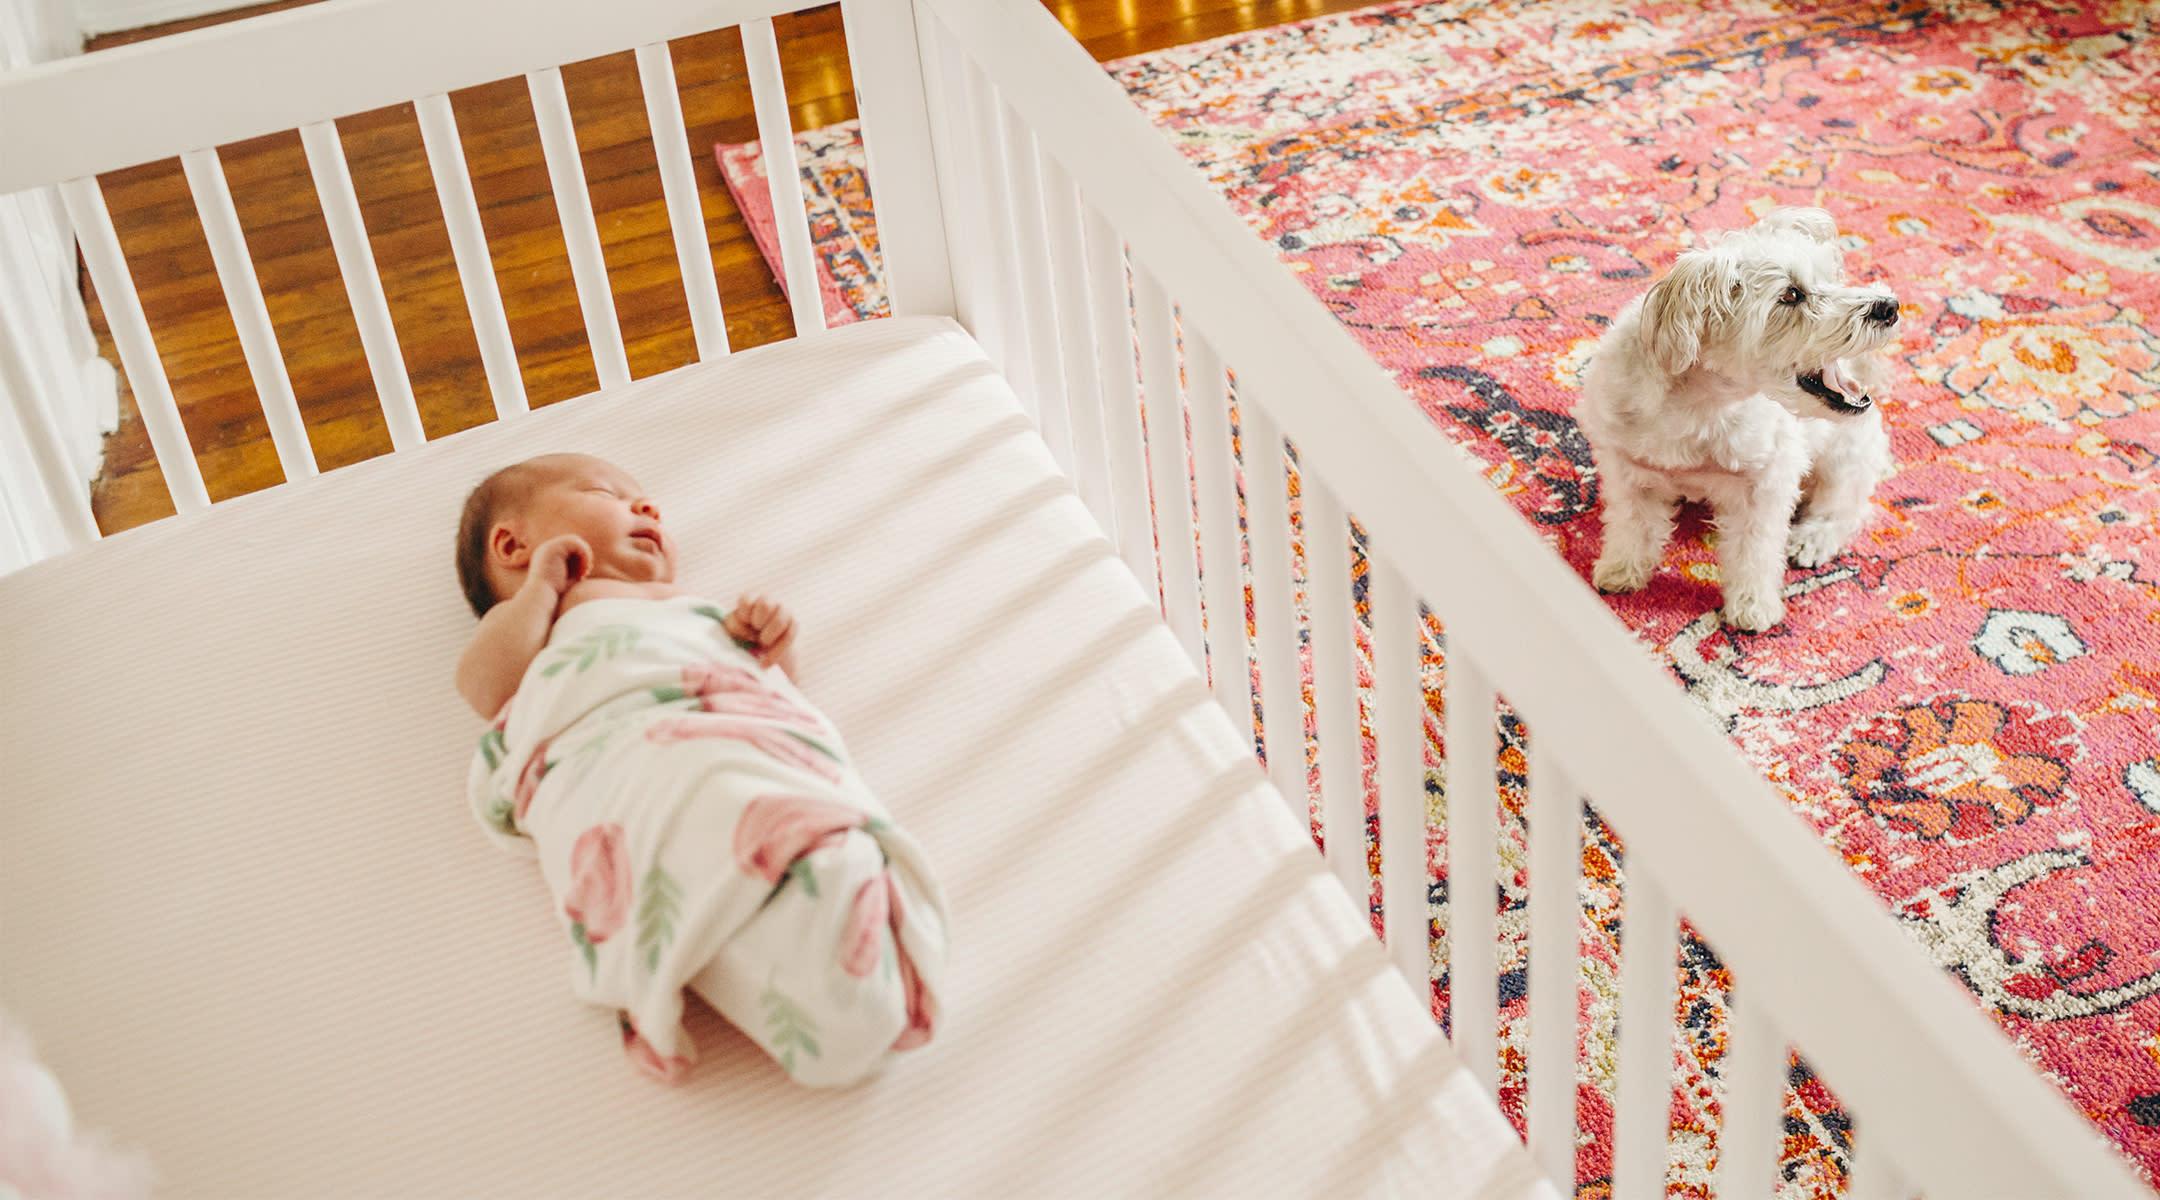 newborn baby sleeping with swaddle in crib